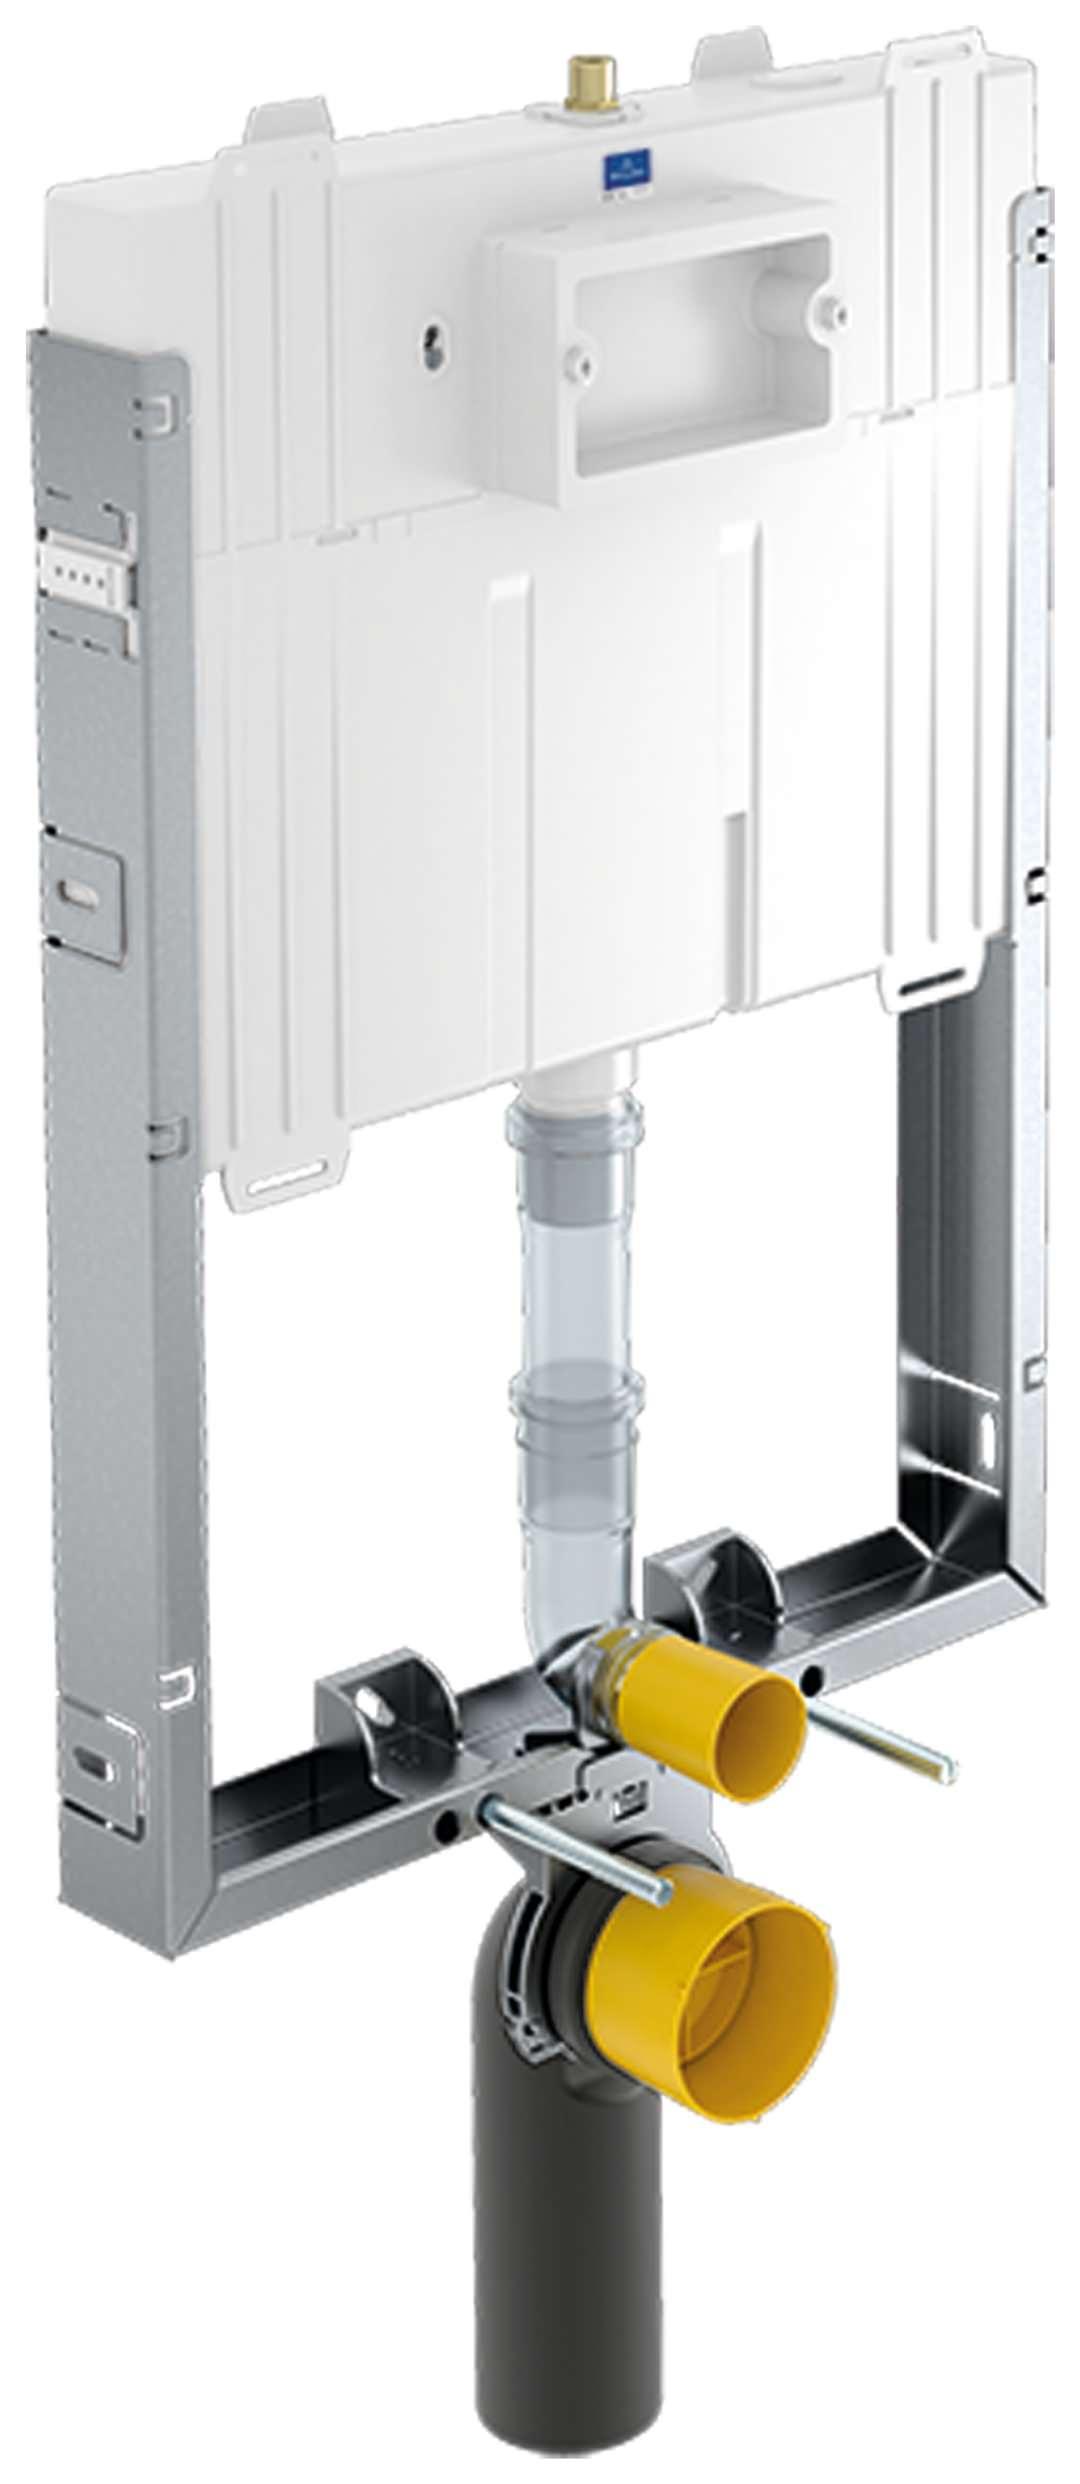 Villeroy boch viconnect vorwandelement wc element - Duschkabine villeroy boch ...